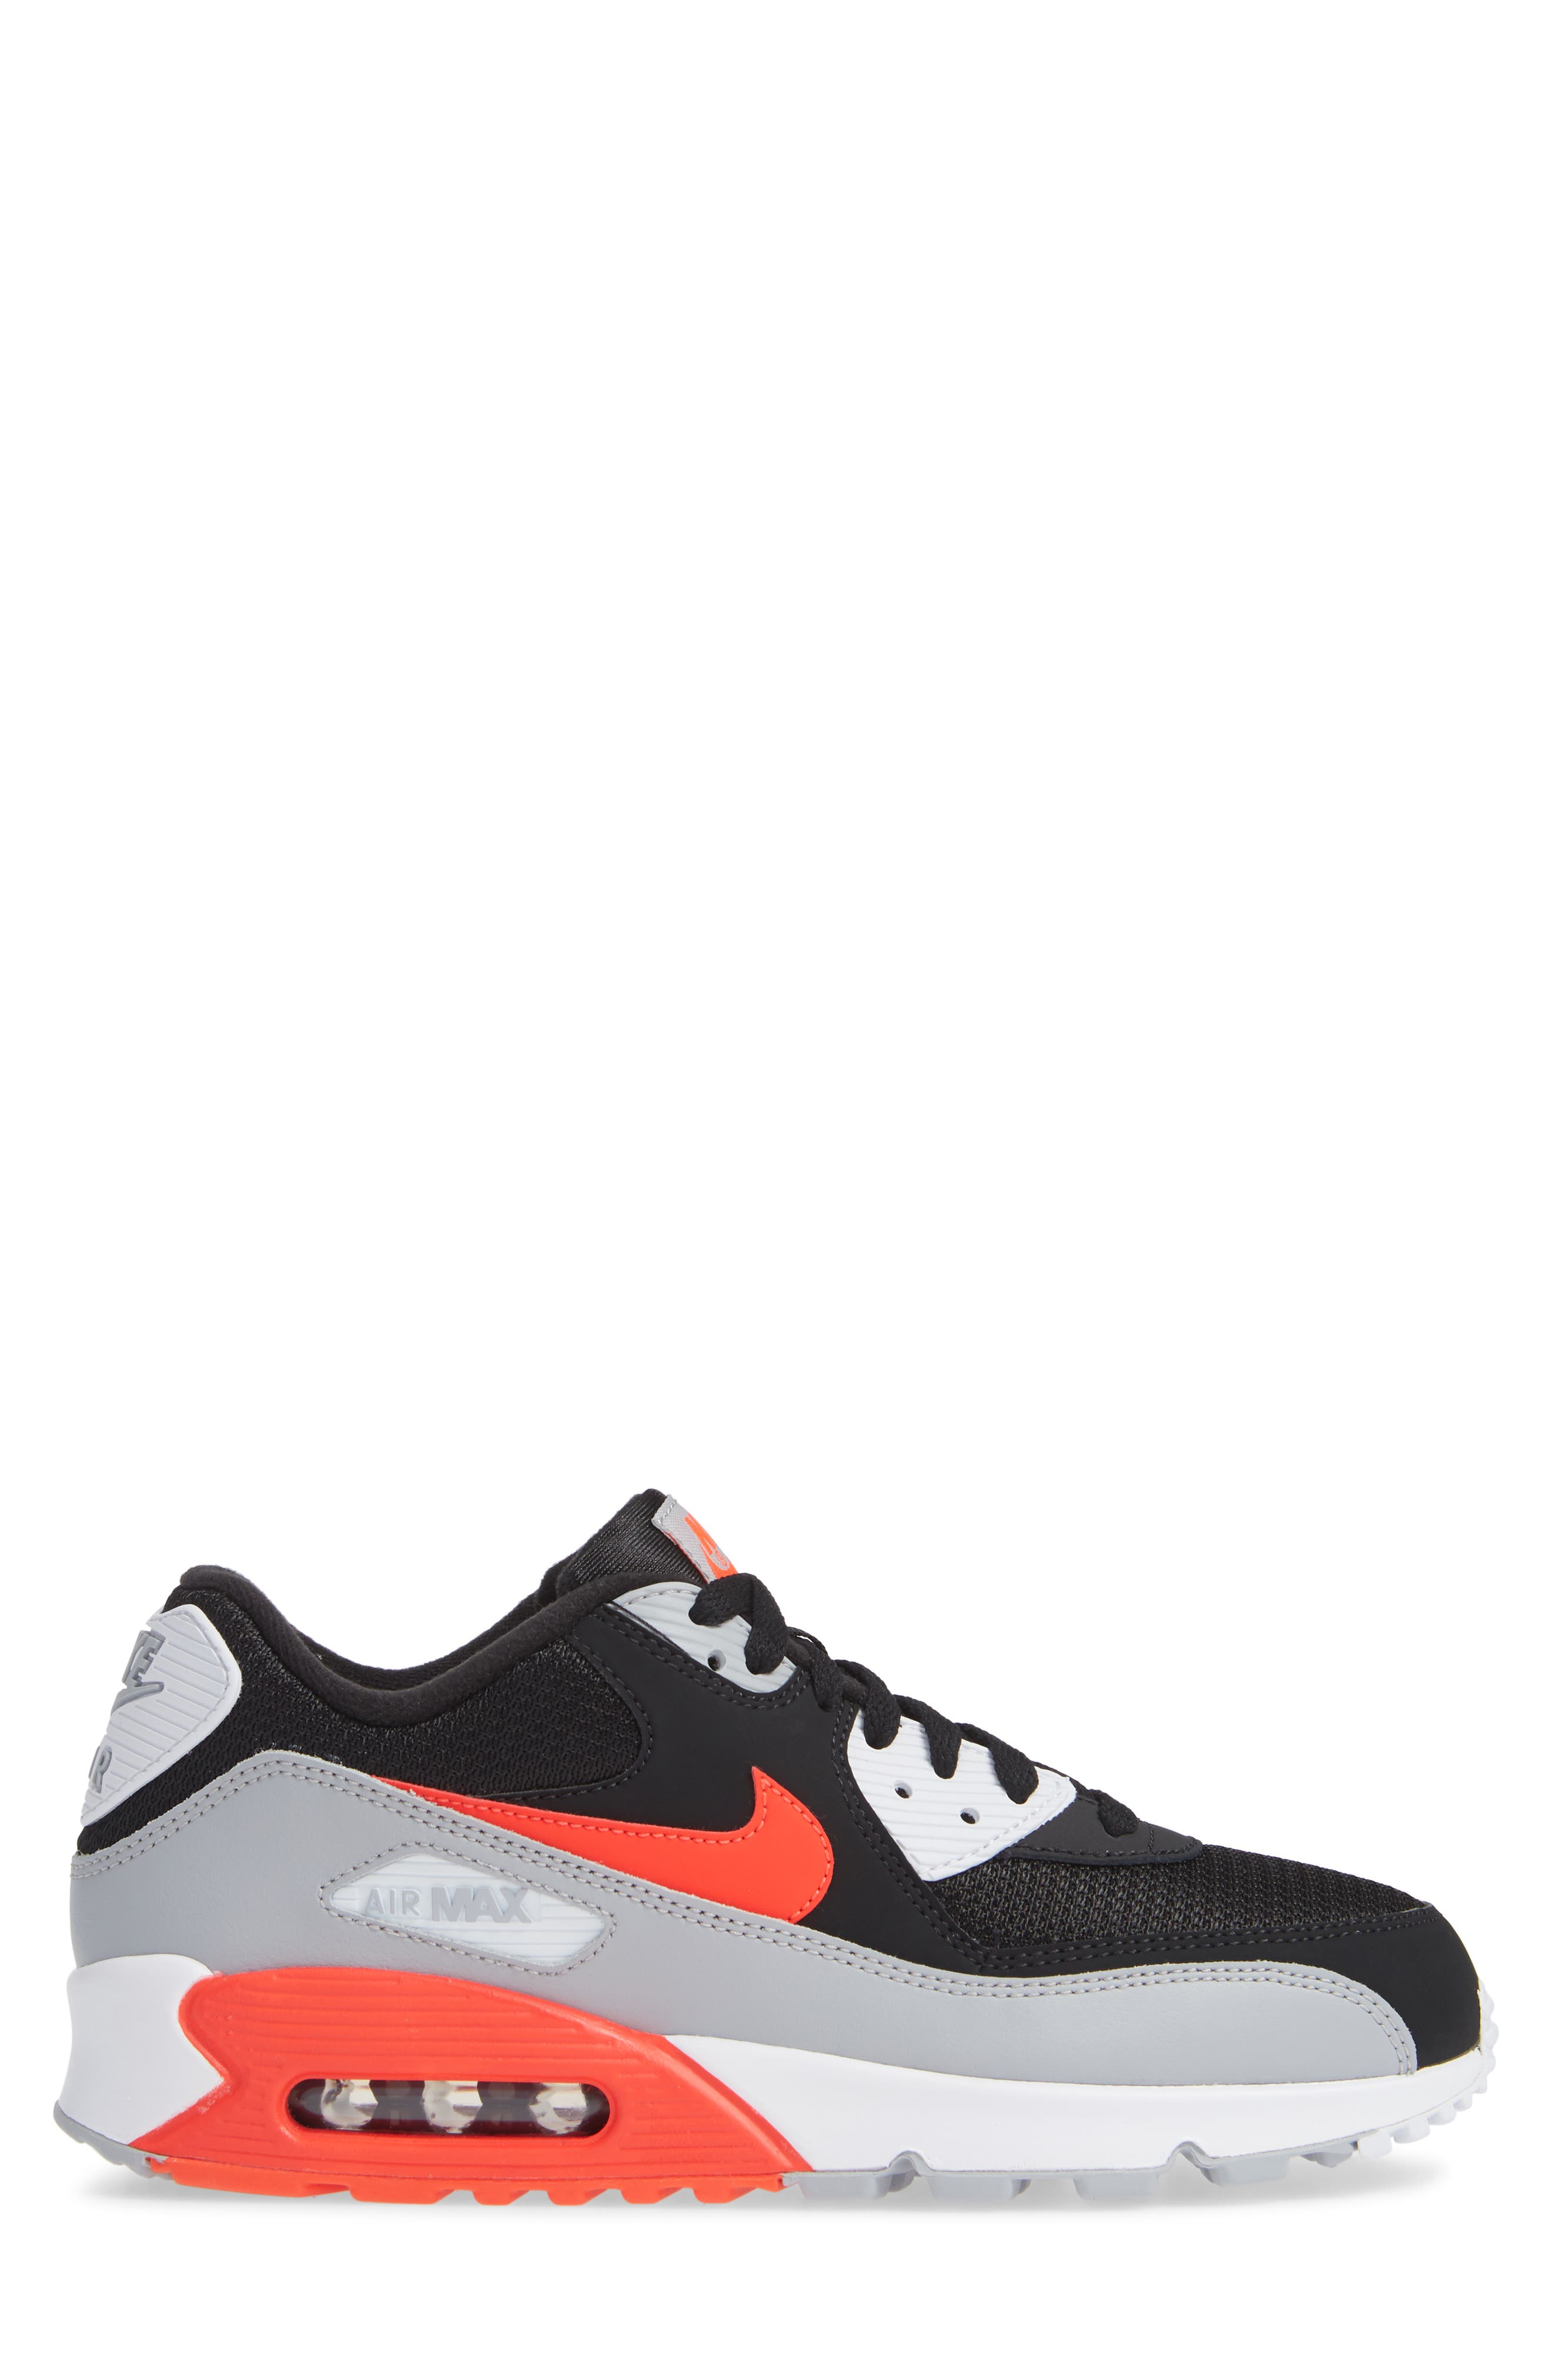 Air Max 90 Essential Sneaker,                             Alternate thumbnail 3, color,                             WOLF GREY/ CRIMSON/ BLACK